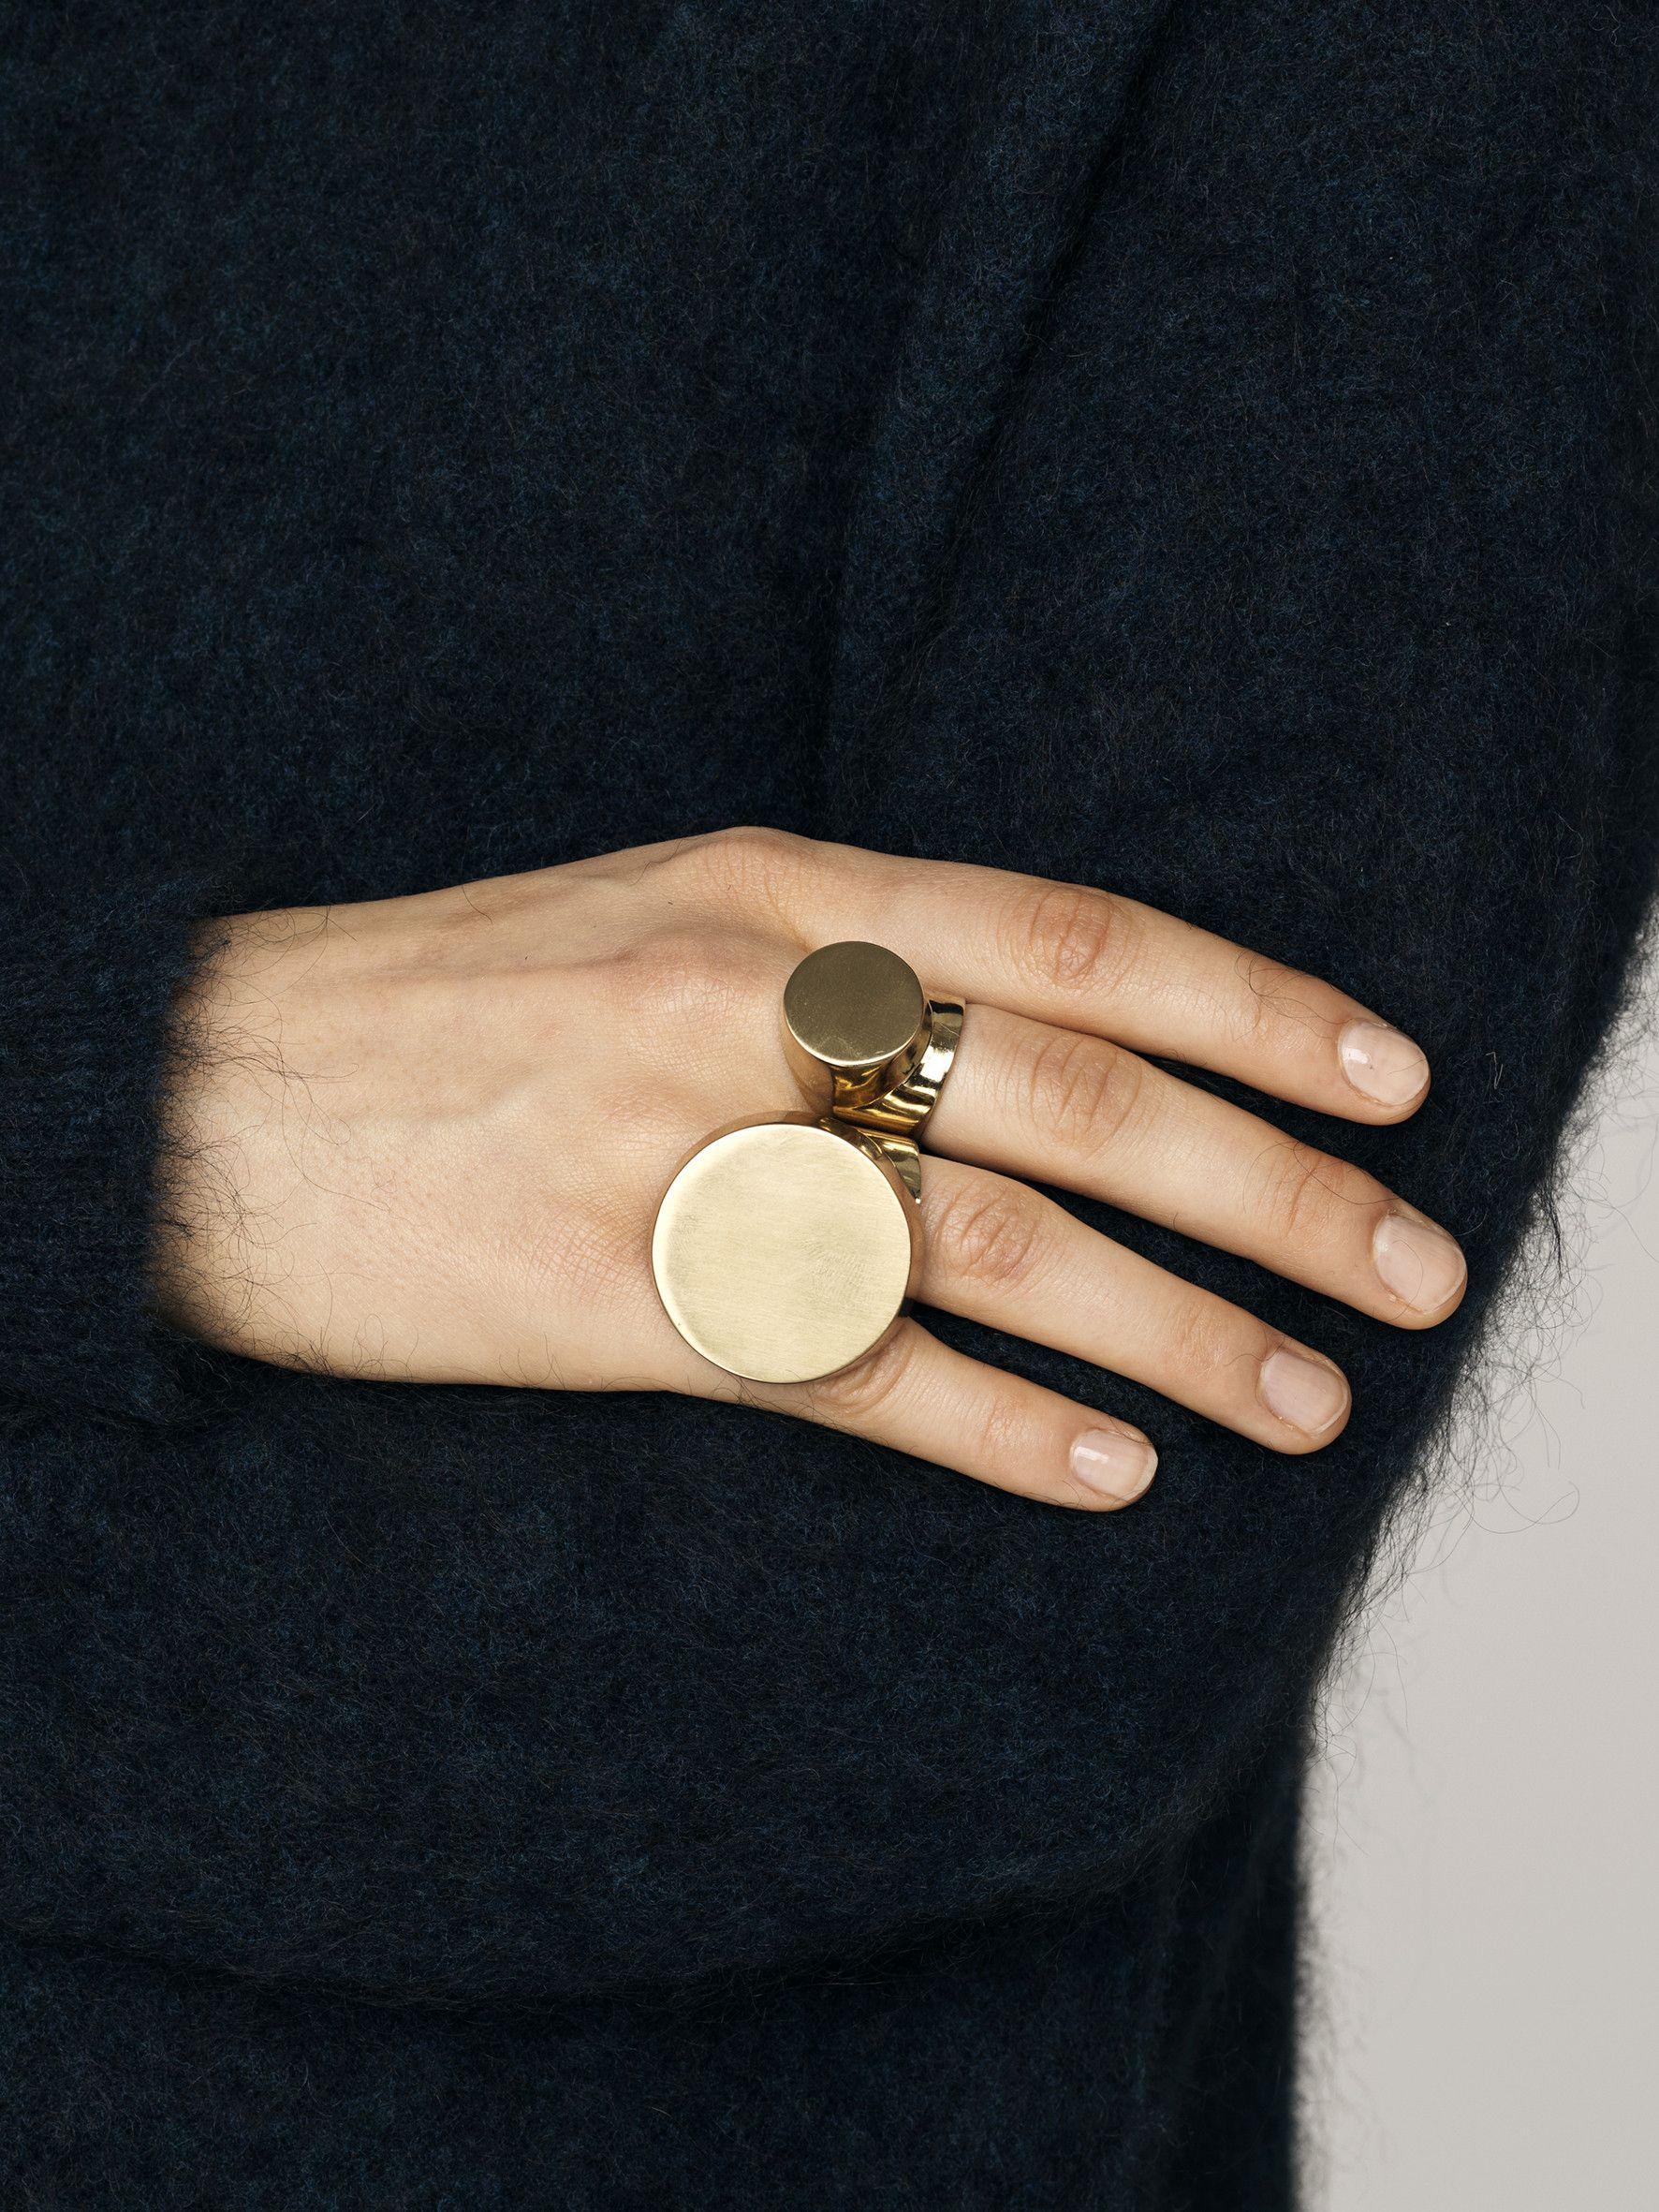 Saint Ring - Buy Jewellery online